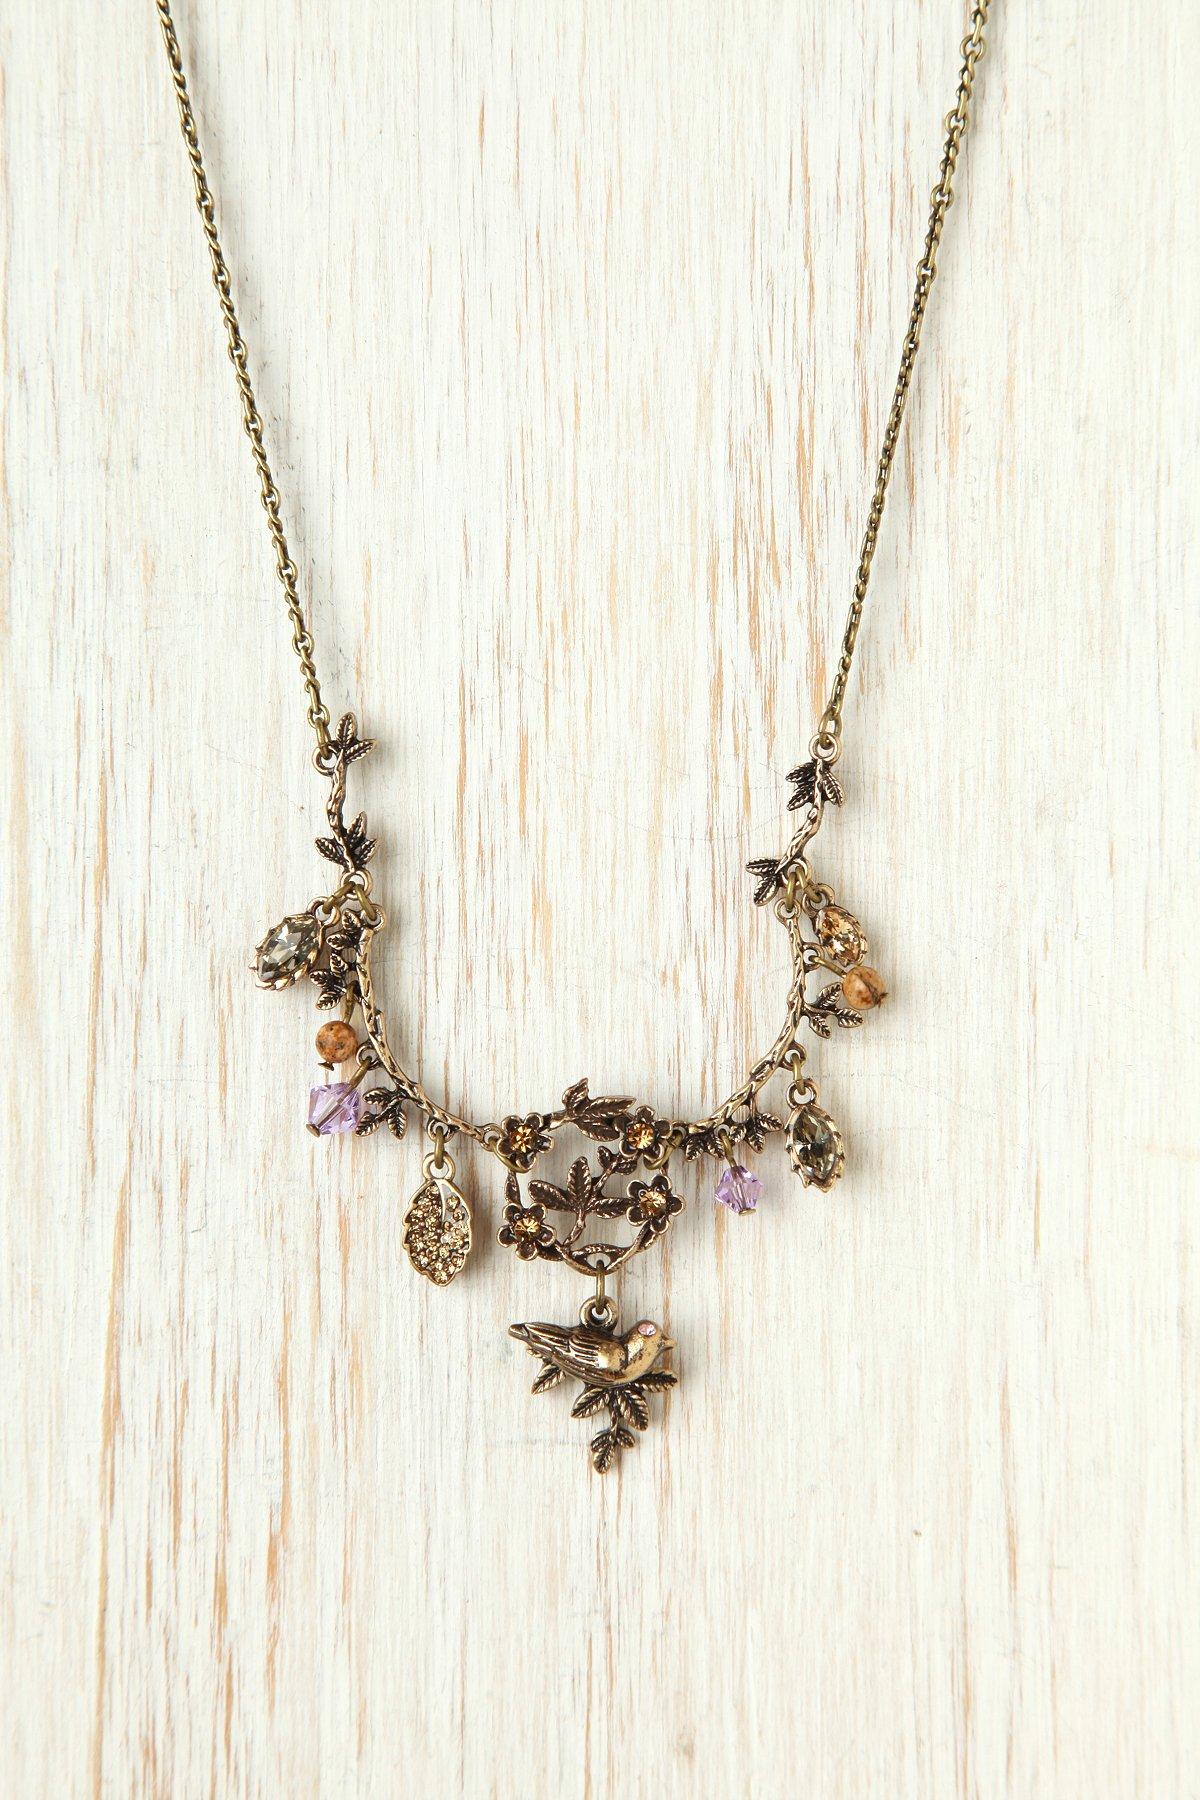 Gem Stone and Leaf Bib Necklace